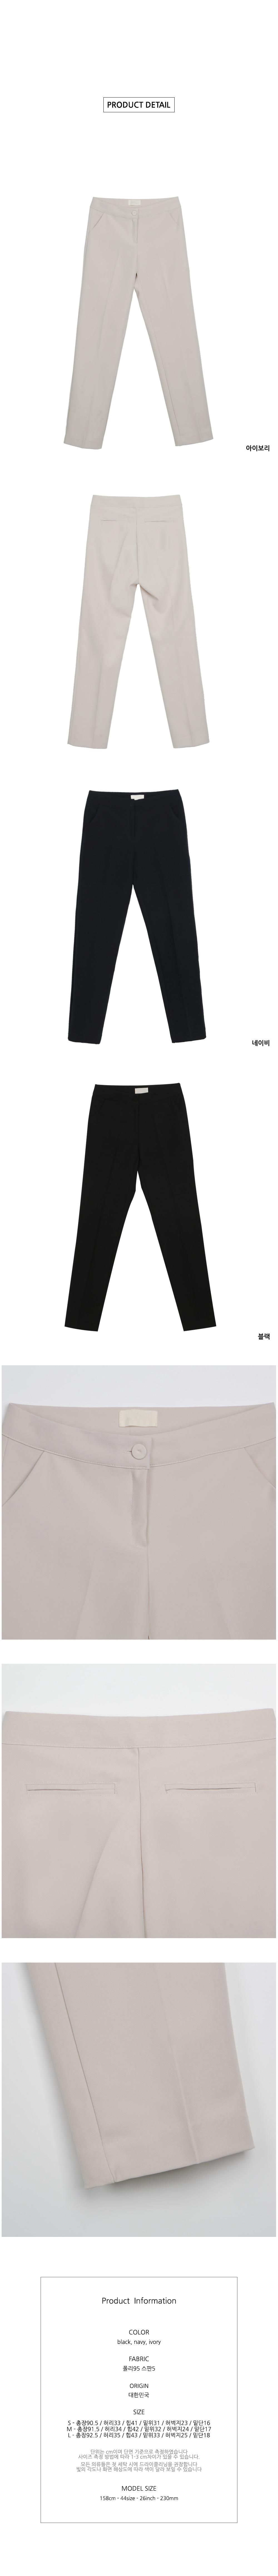 Slim Date Fit Basic Slacks P#YW416